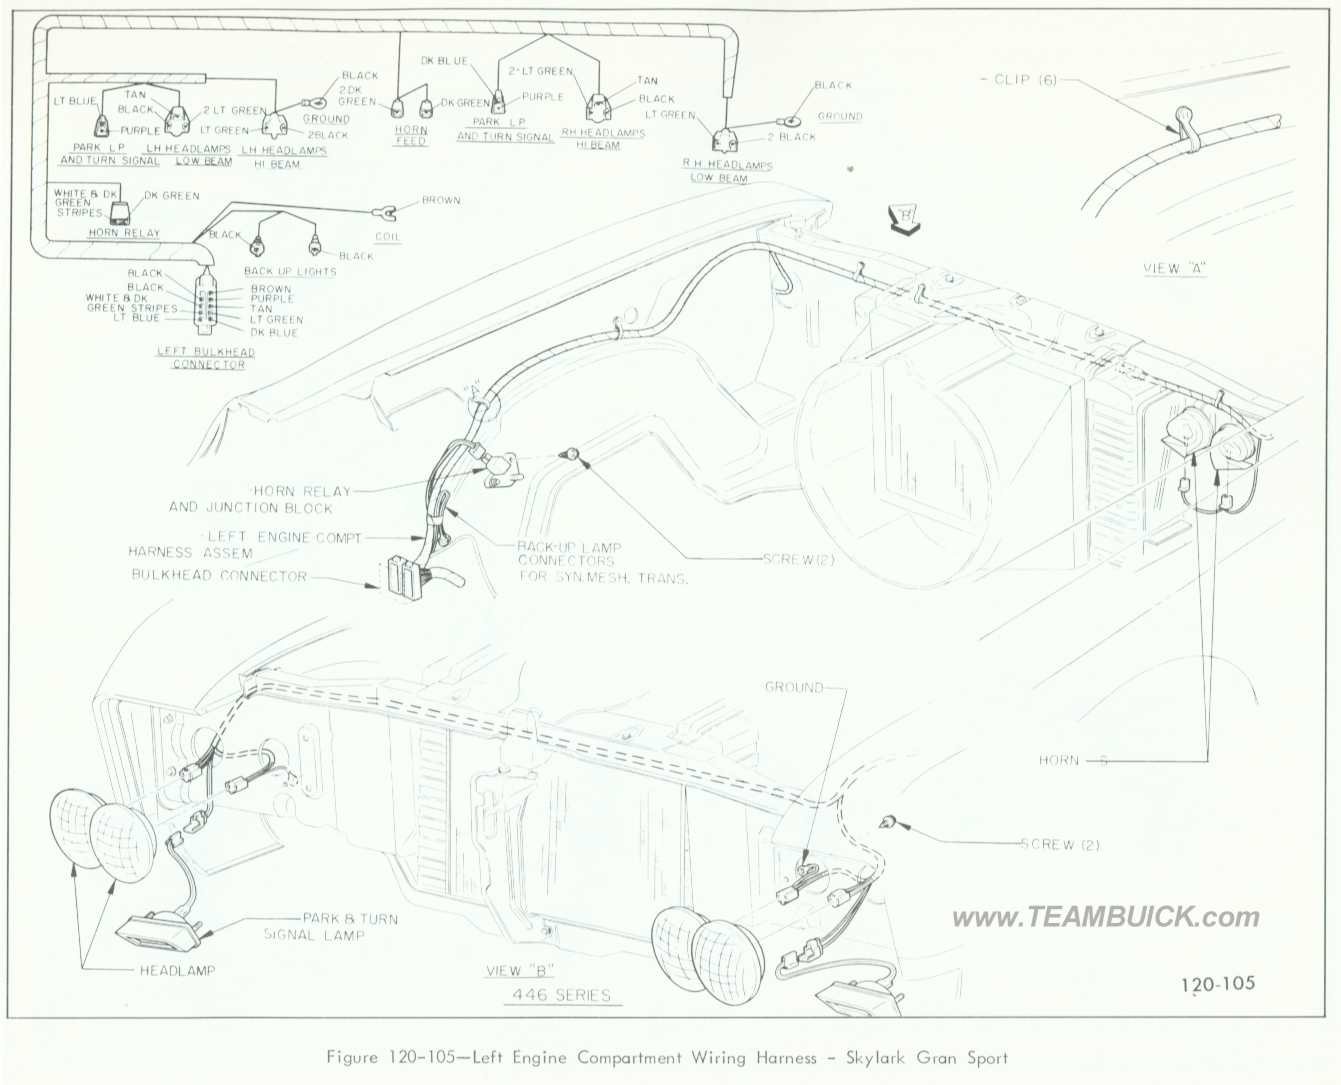 hight resolution of 1966 buick skylark gran sport left engine compartment wiring harness 1966 buick skylark wiring harness